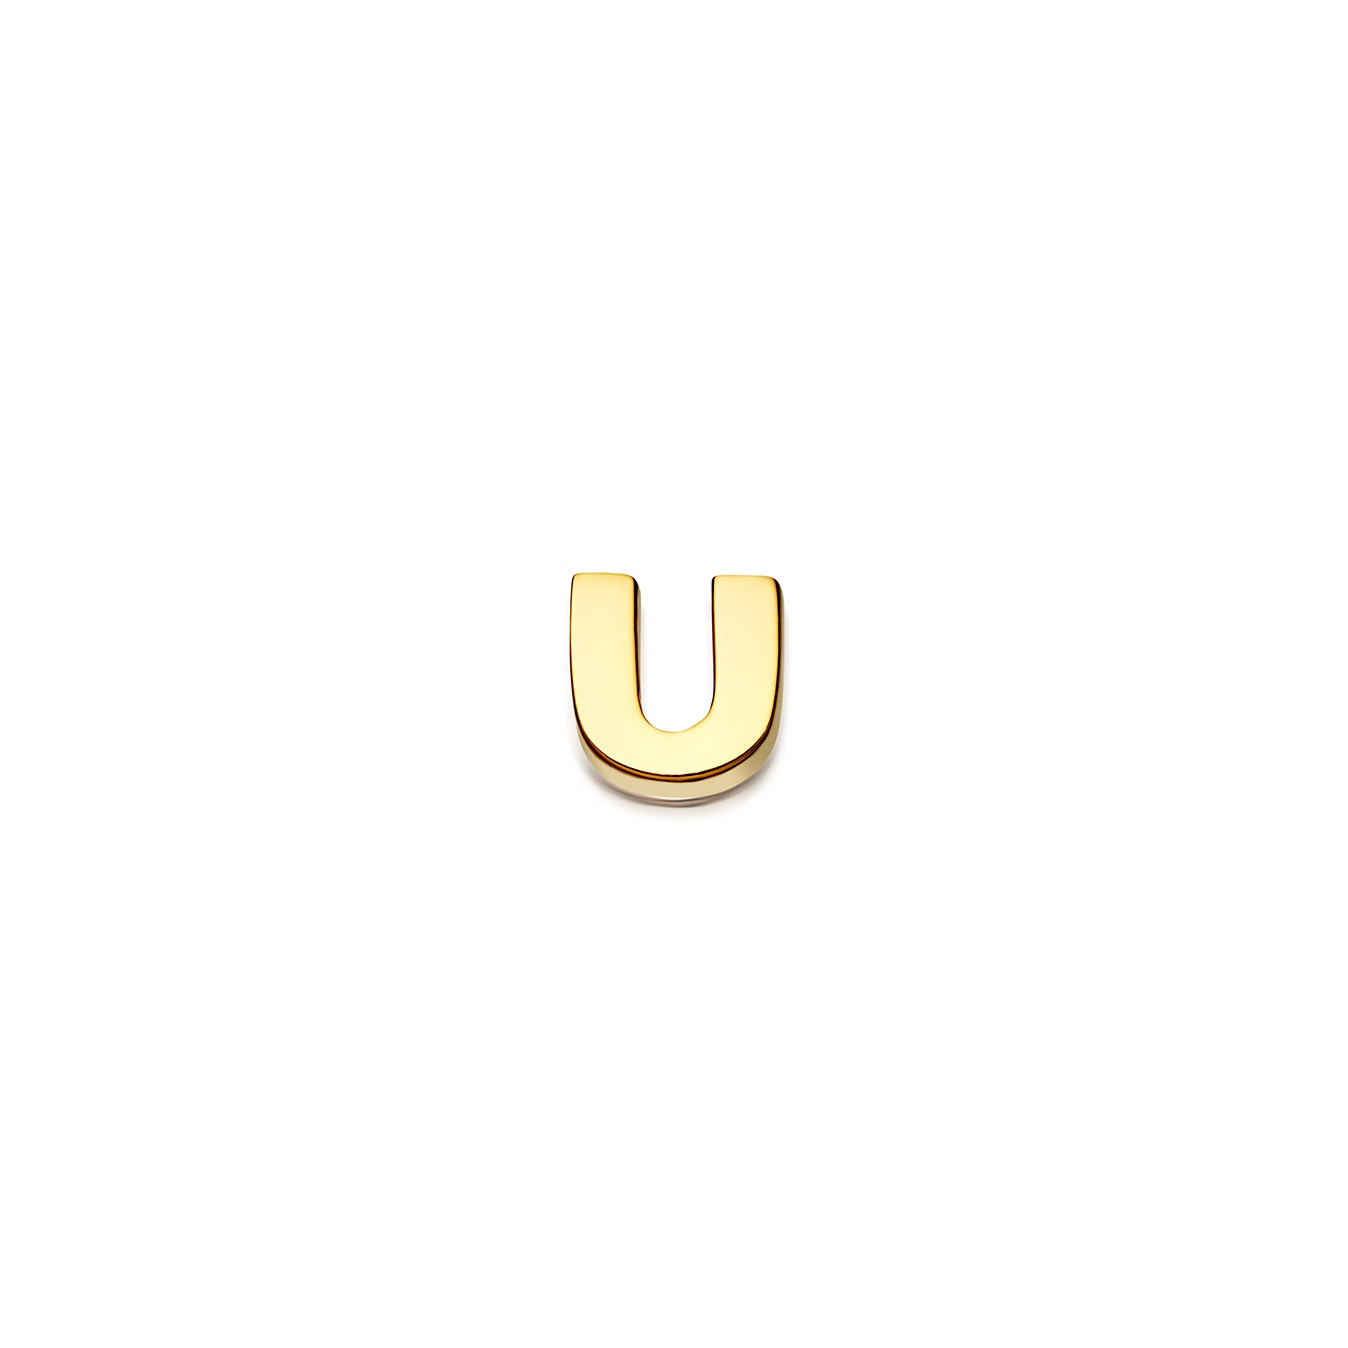 Initial 'U' Biography Pin